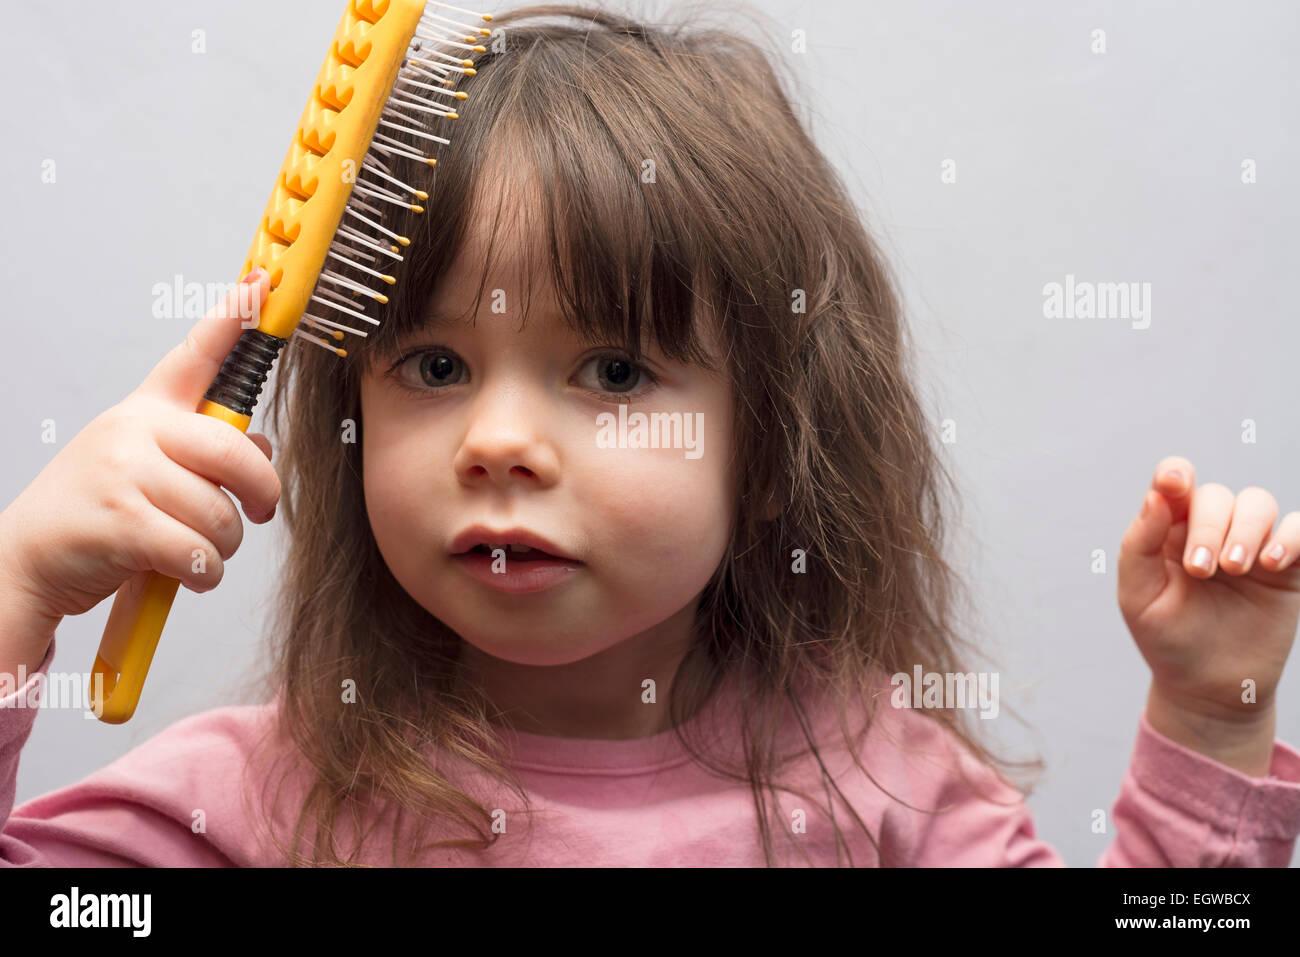 2year old girl brushing her hair stock photo 79233754